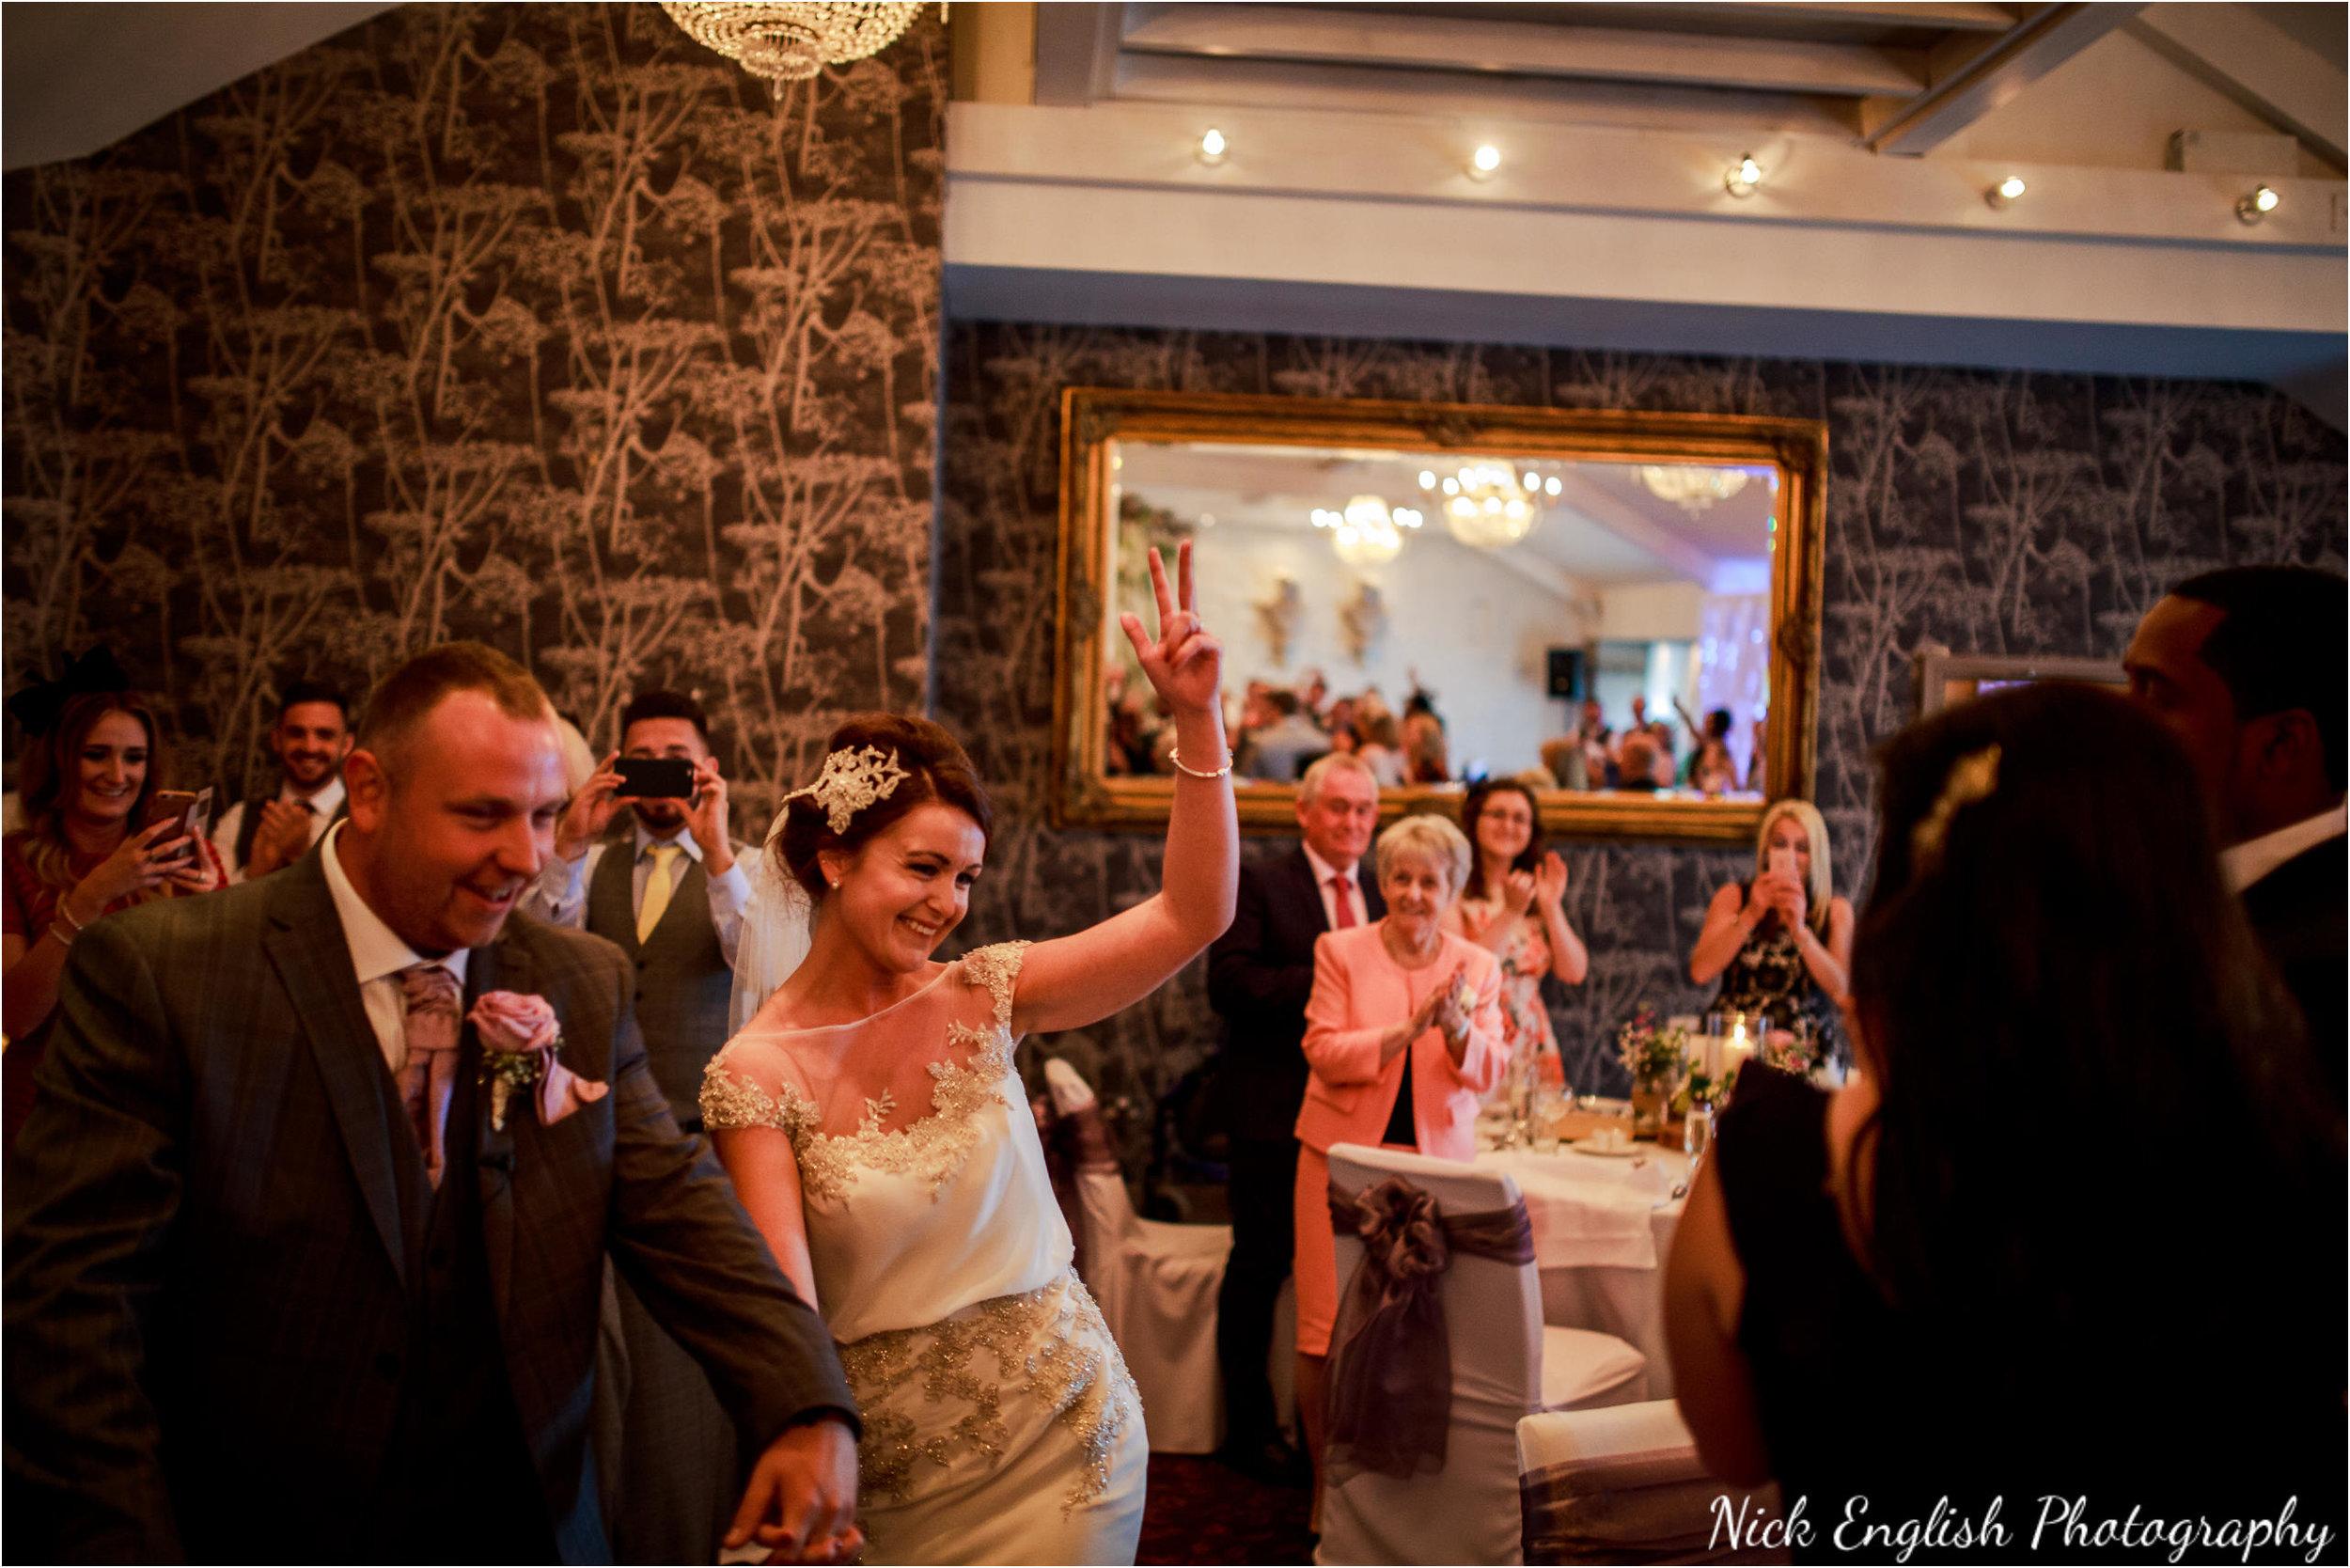 Stacey-Ash-Wedding-Photographs-Stanley-House-Preston-Lancashire-146.jpg